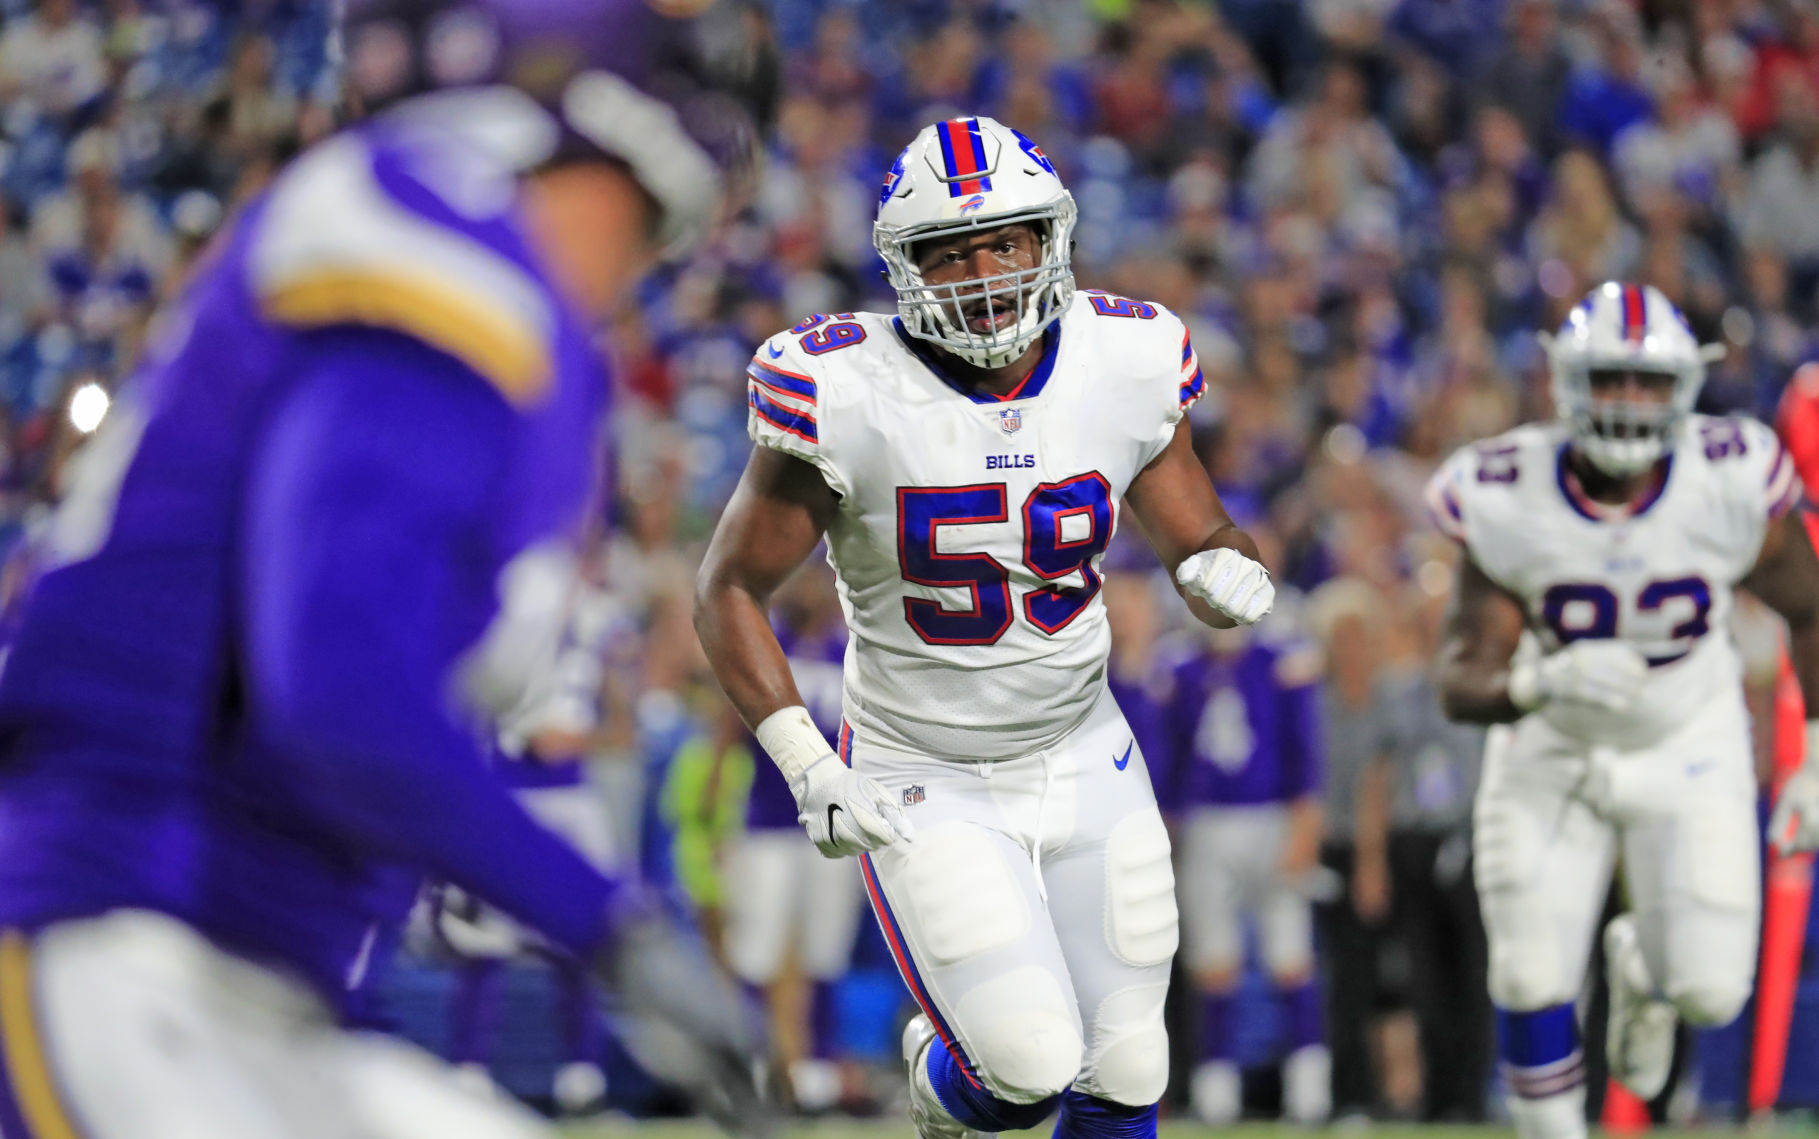 Bills trade Ragland to Chiefs for 2019 4th-round pick | Buffalo ...